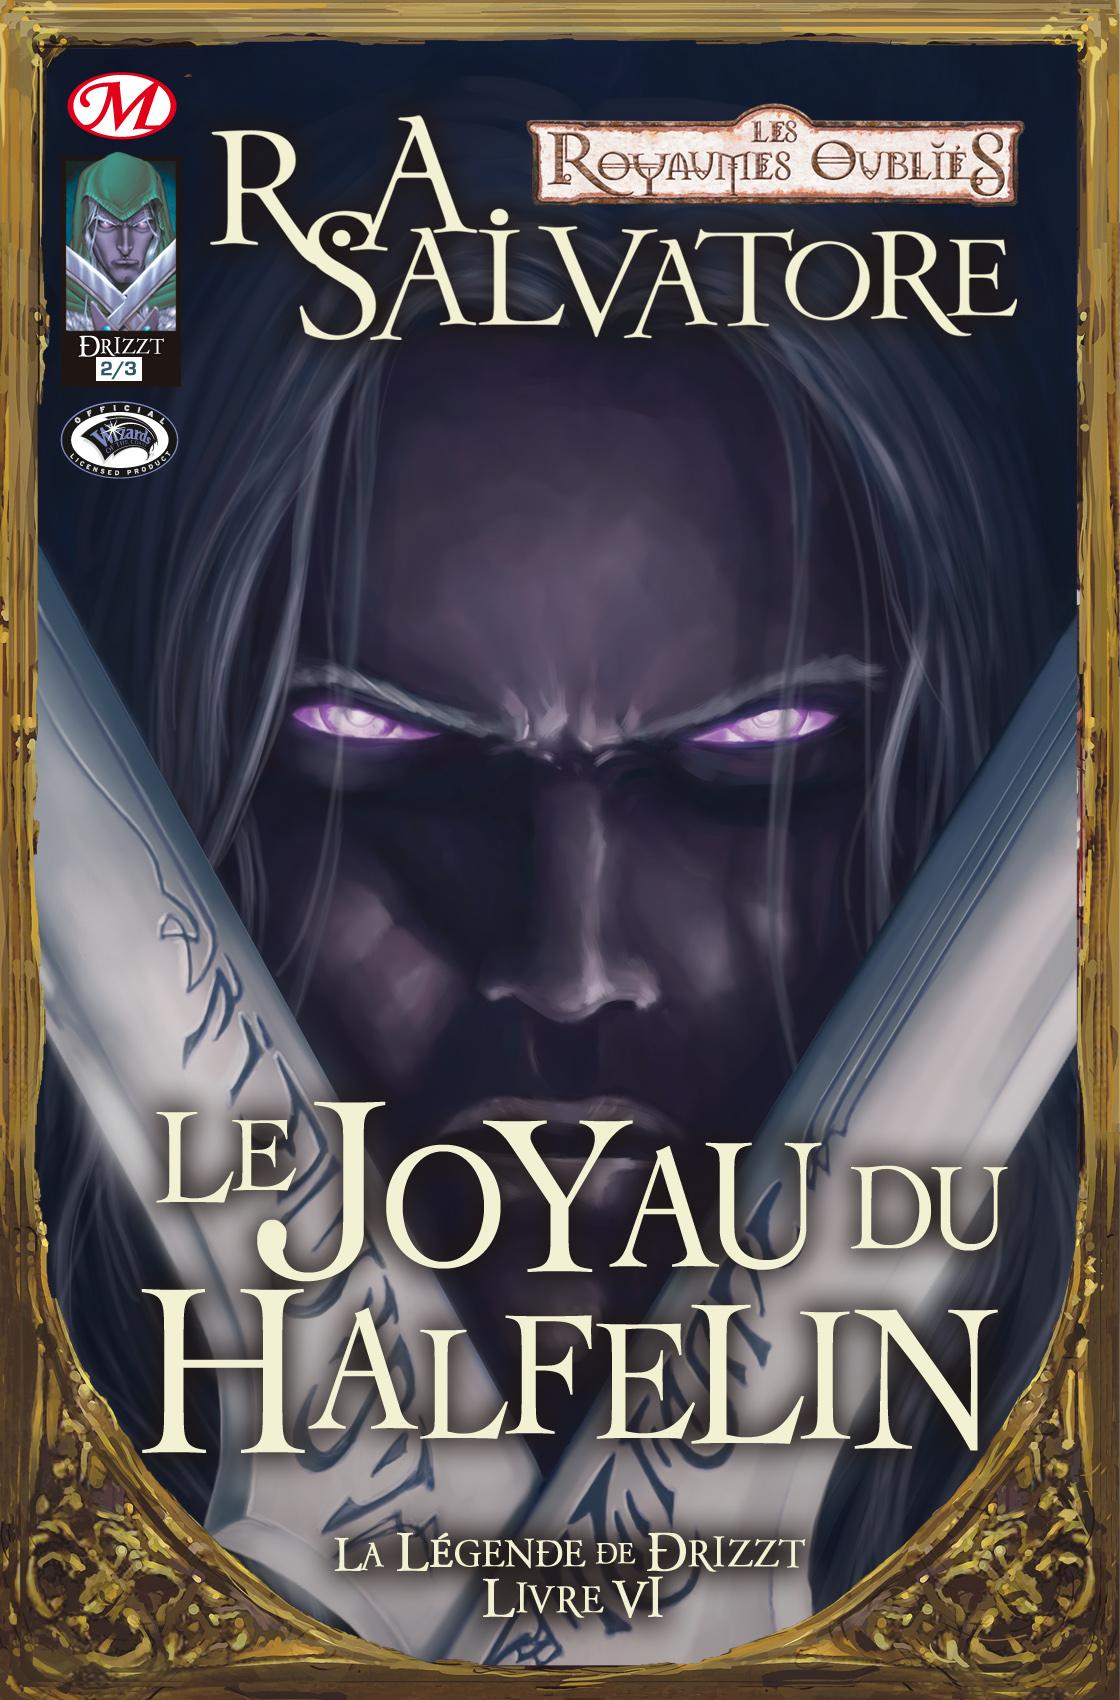 Le Joyau du halfelin 2/3, LA LÉGENDE DE DRIZZT, T6